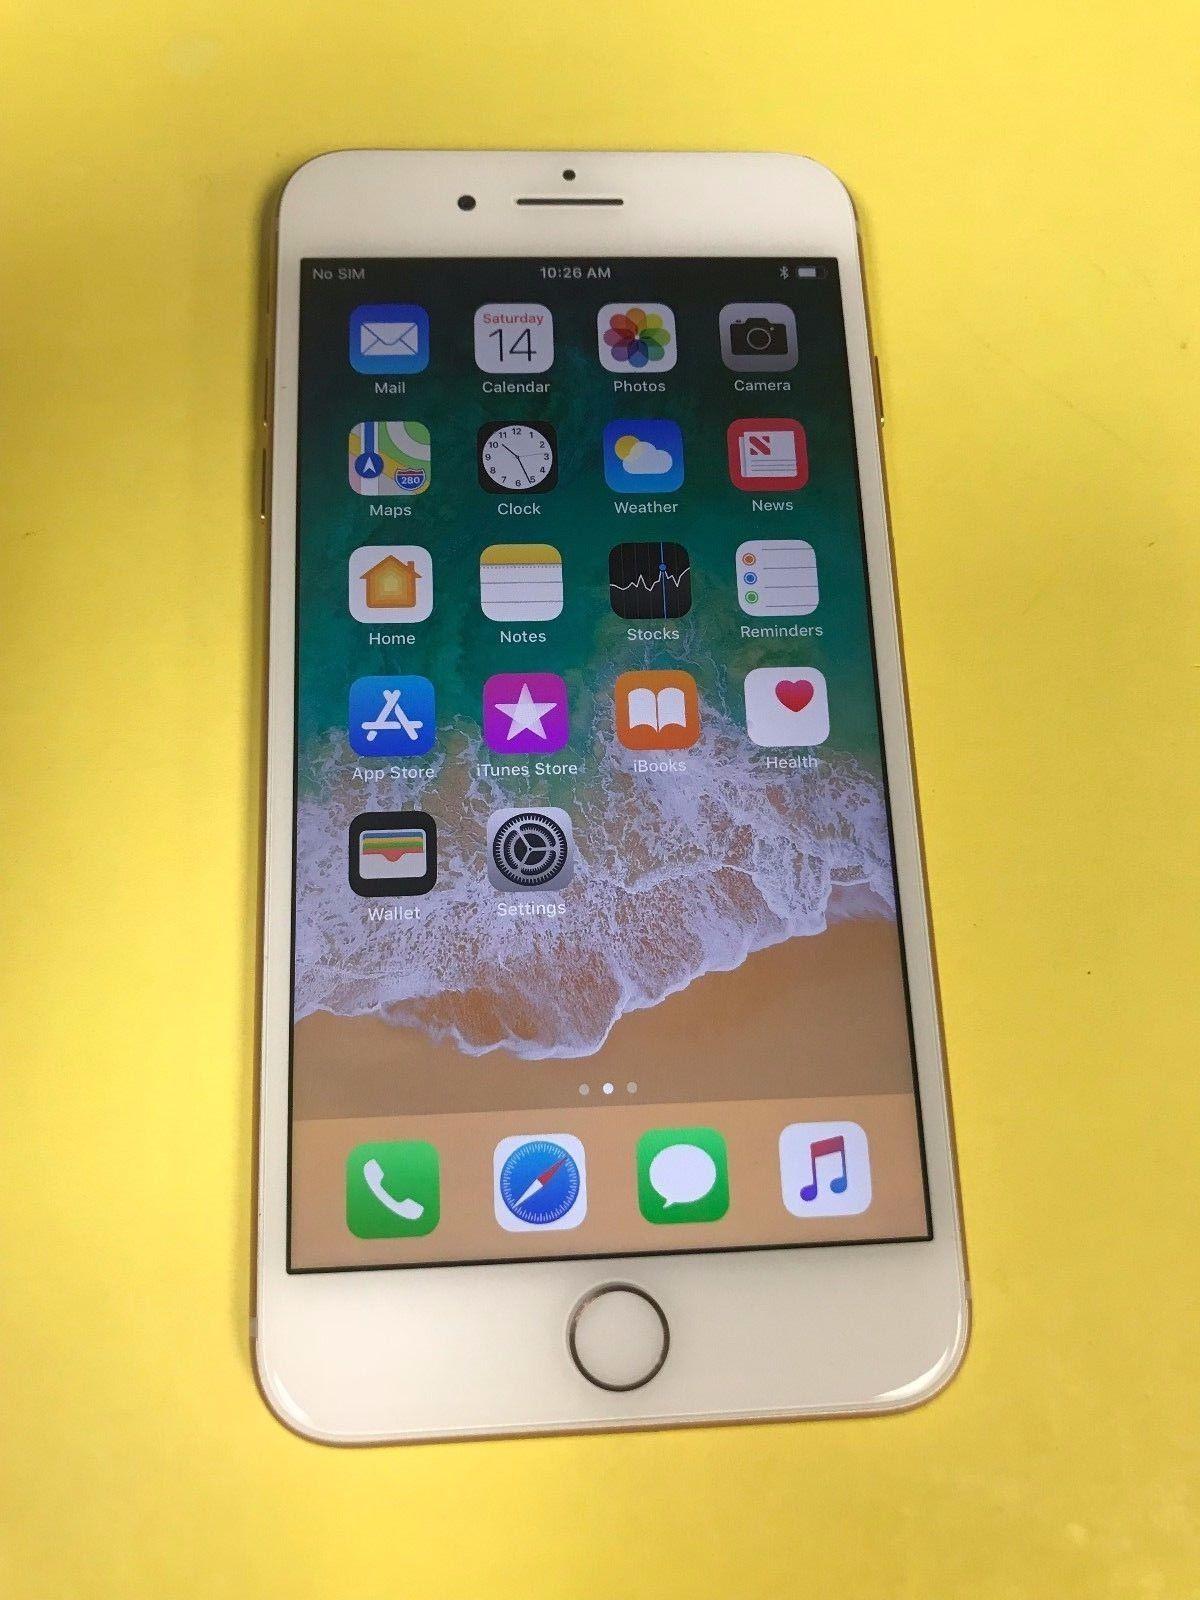 Apple Iphone 8 Plus 256gb Gold At T Smartphone Great Condition Apple Iphone Iphone Iphone 8 Plus